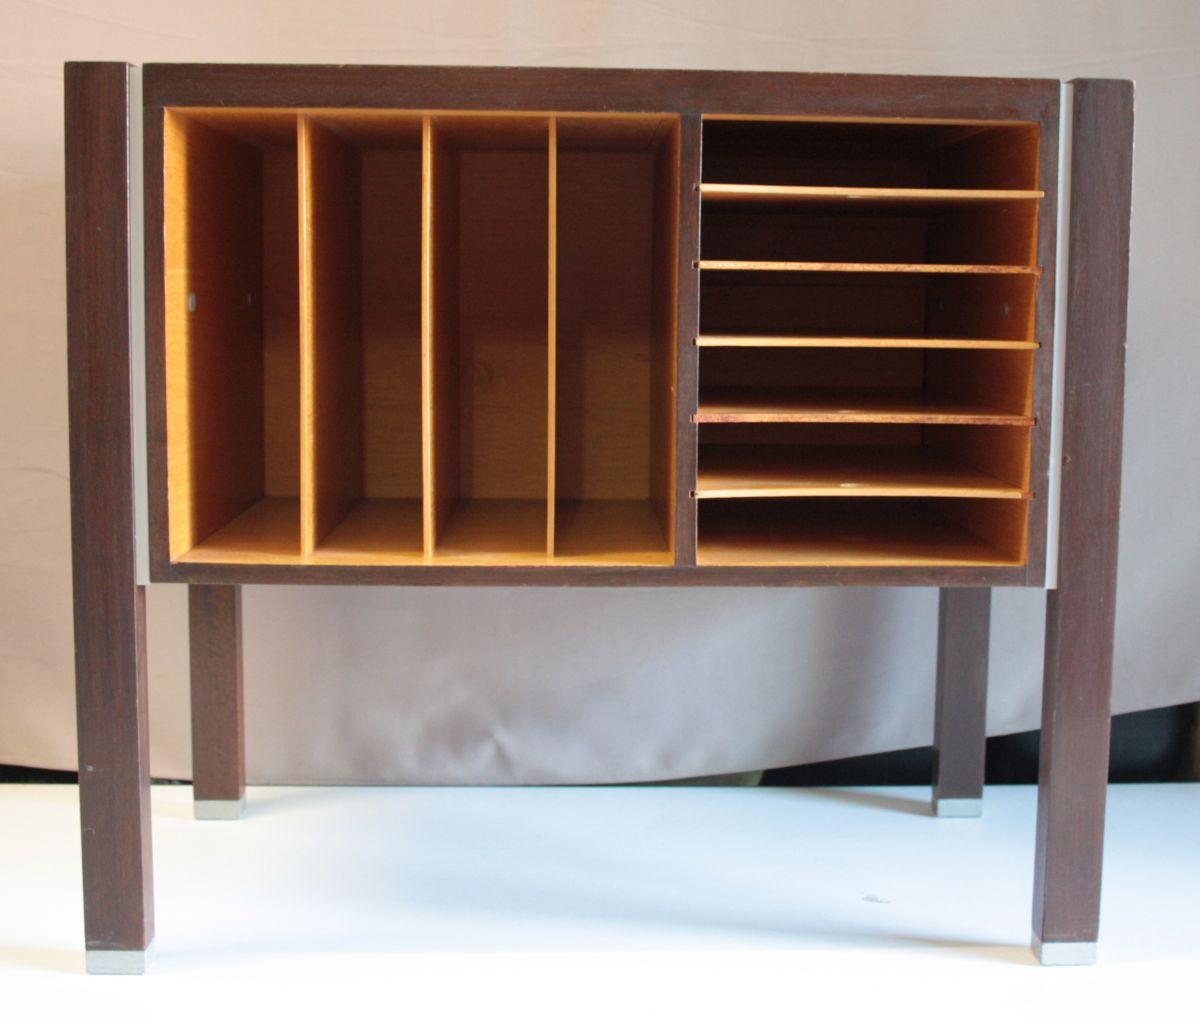 meuble classeur trieur ann es 70 design luckyfind. Black Bedroom Furniture Sets. Home Design Ideas